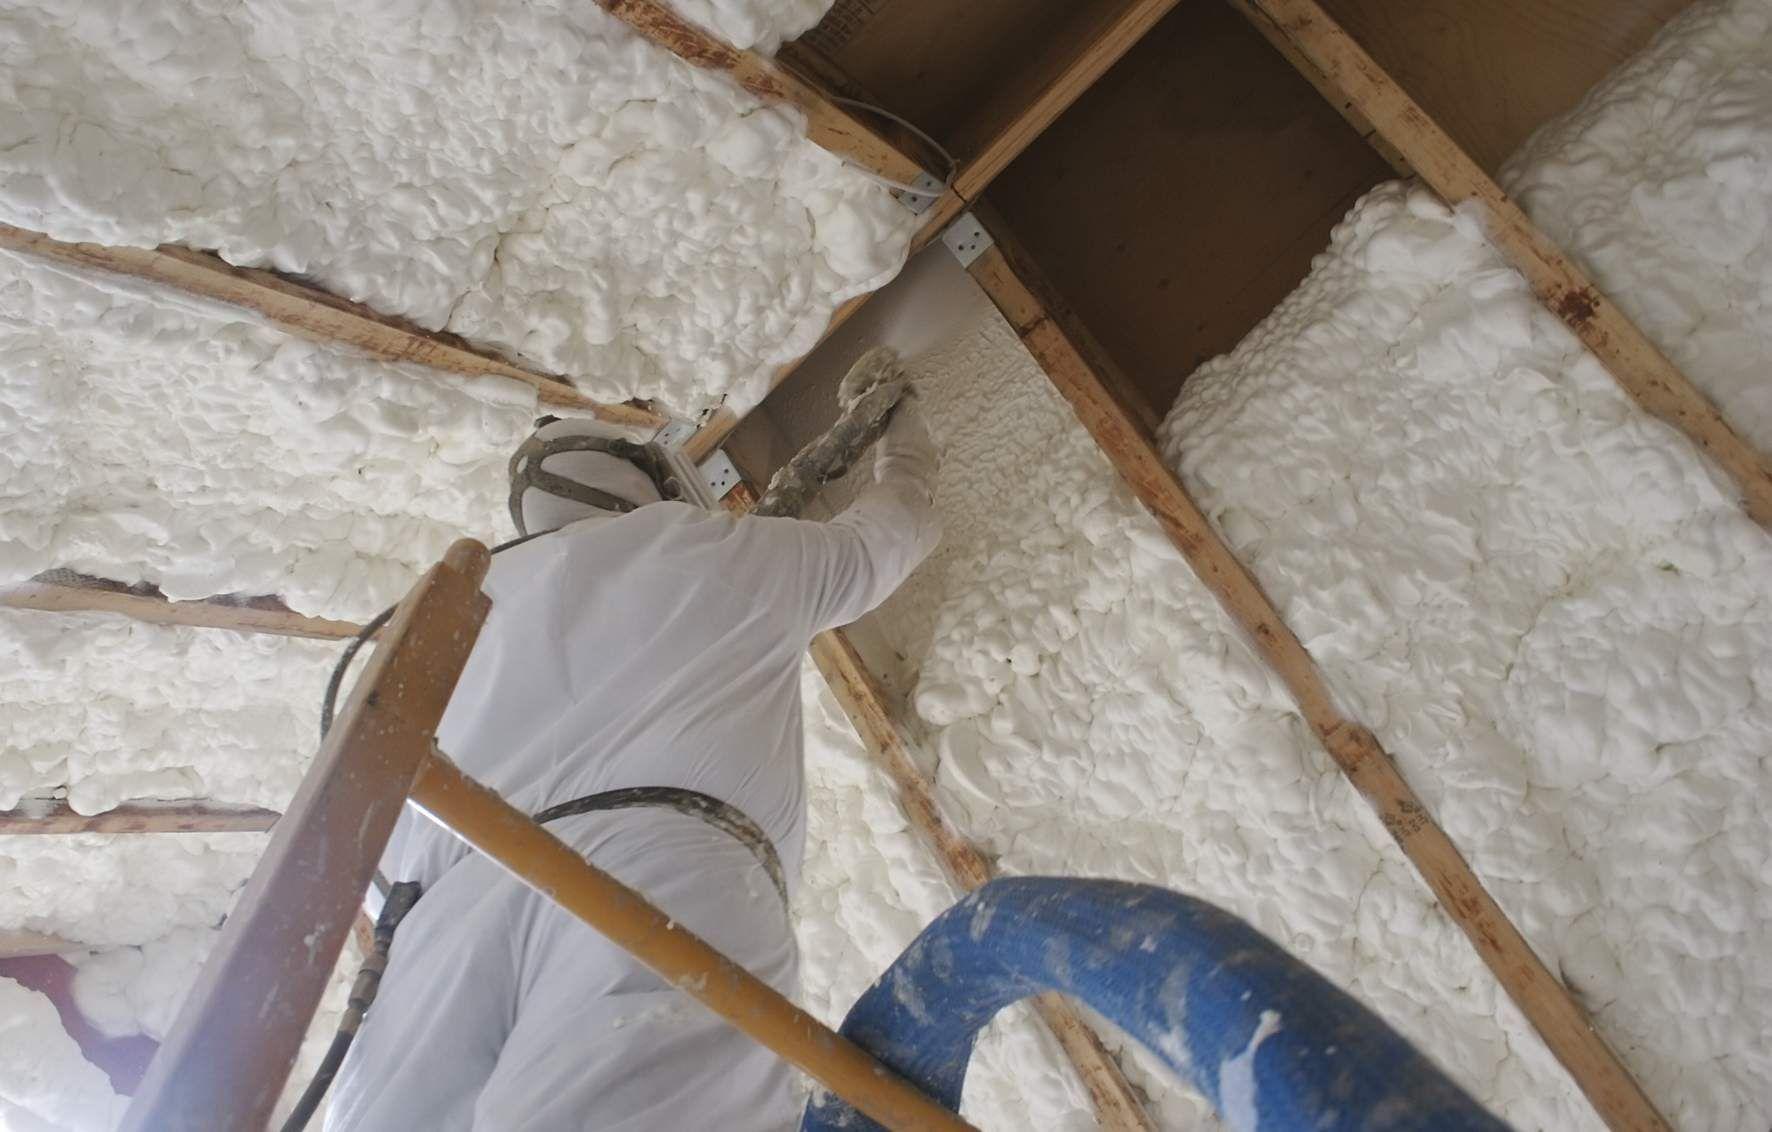 Graco Spray Foam Insulation Equipment Spray Foam Insulation Attic Insulation Attic Flooring